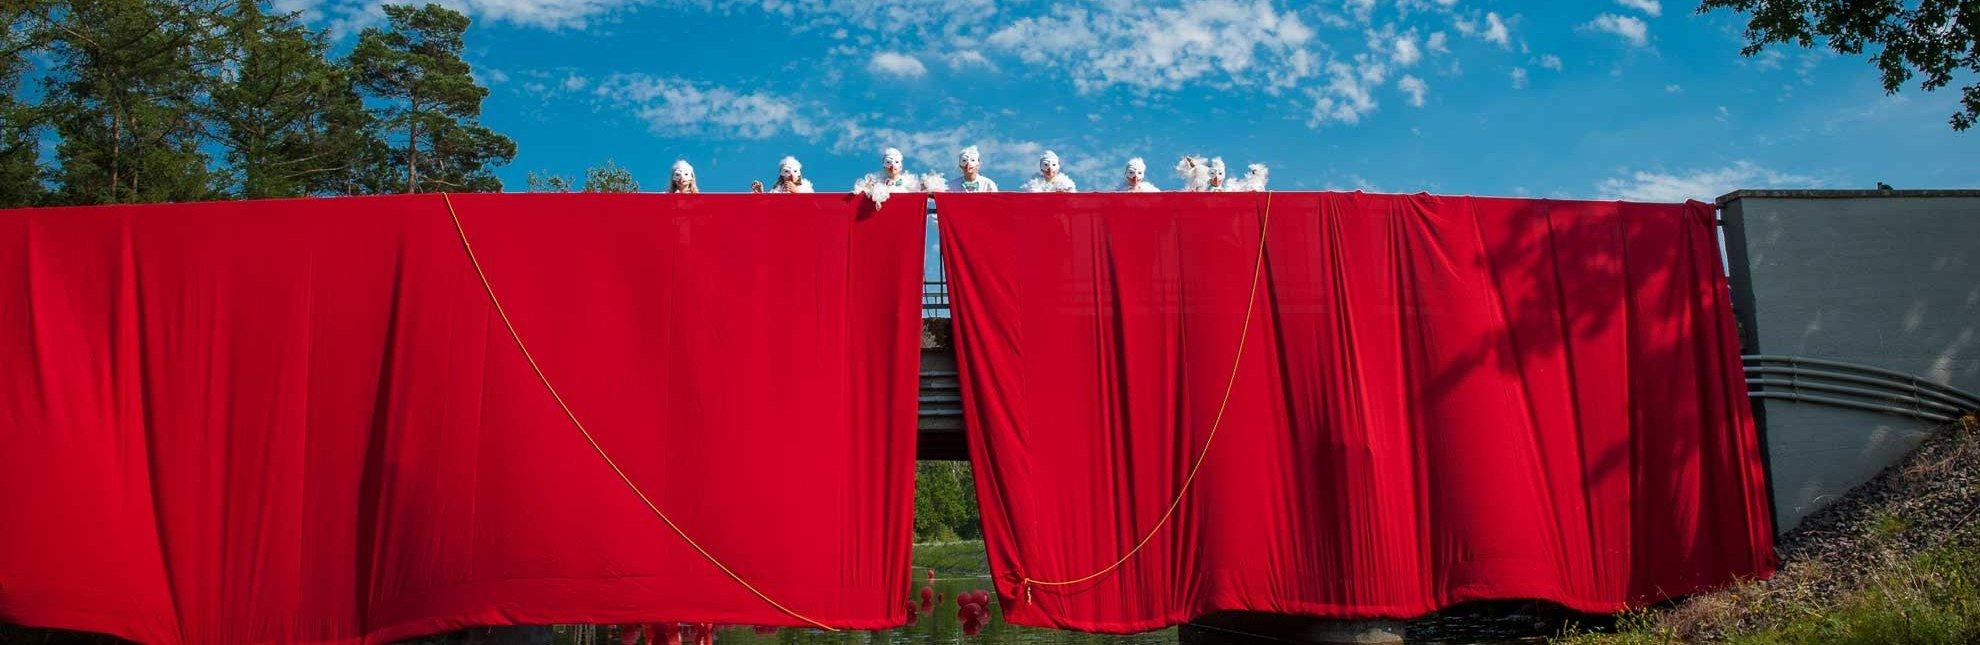 Kanuwandertheater und Kultursommer am Kanal, © Nicole Franke